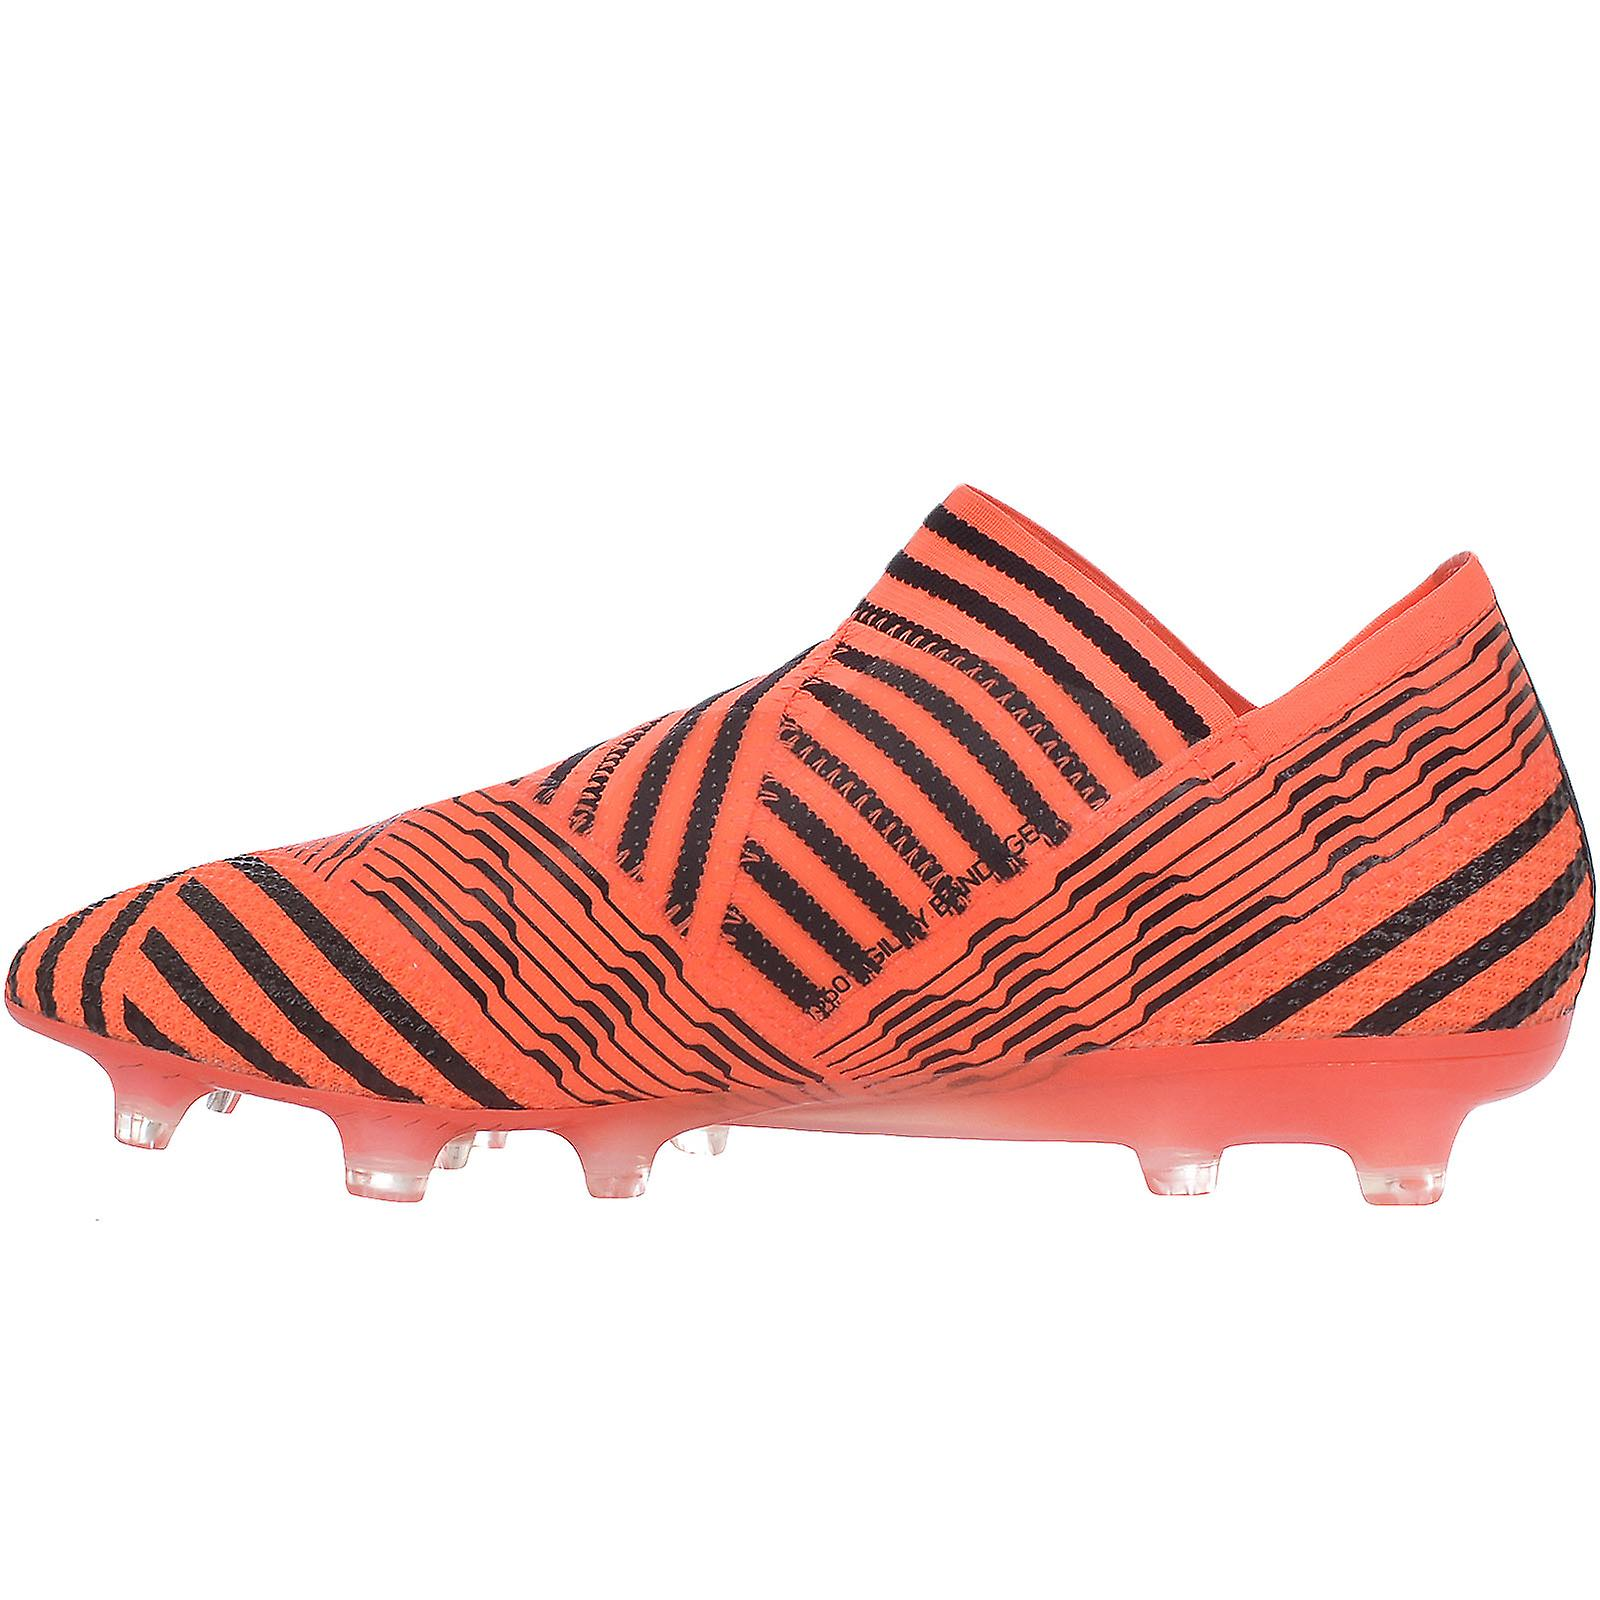 e54790bc0 adidas Performance Mens Nemeziz 17+ 360 agility FG Football Soccer Boots -Orange